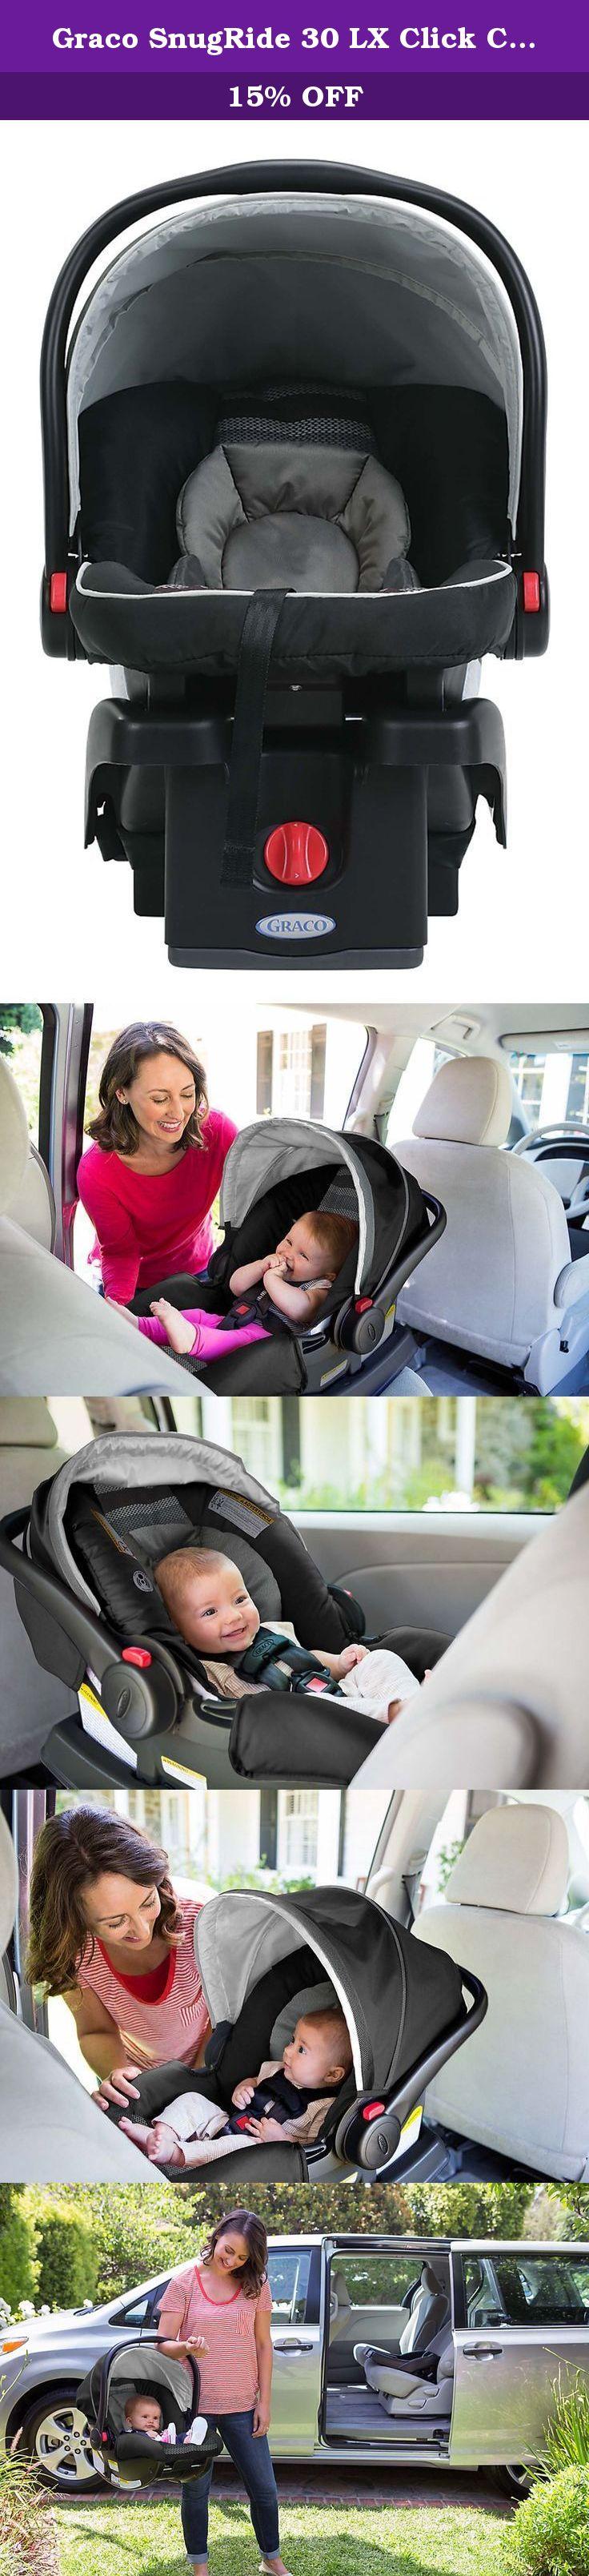 Graco SnugRide 30 LX Click Connect Car Seat Banner